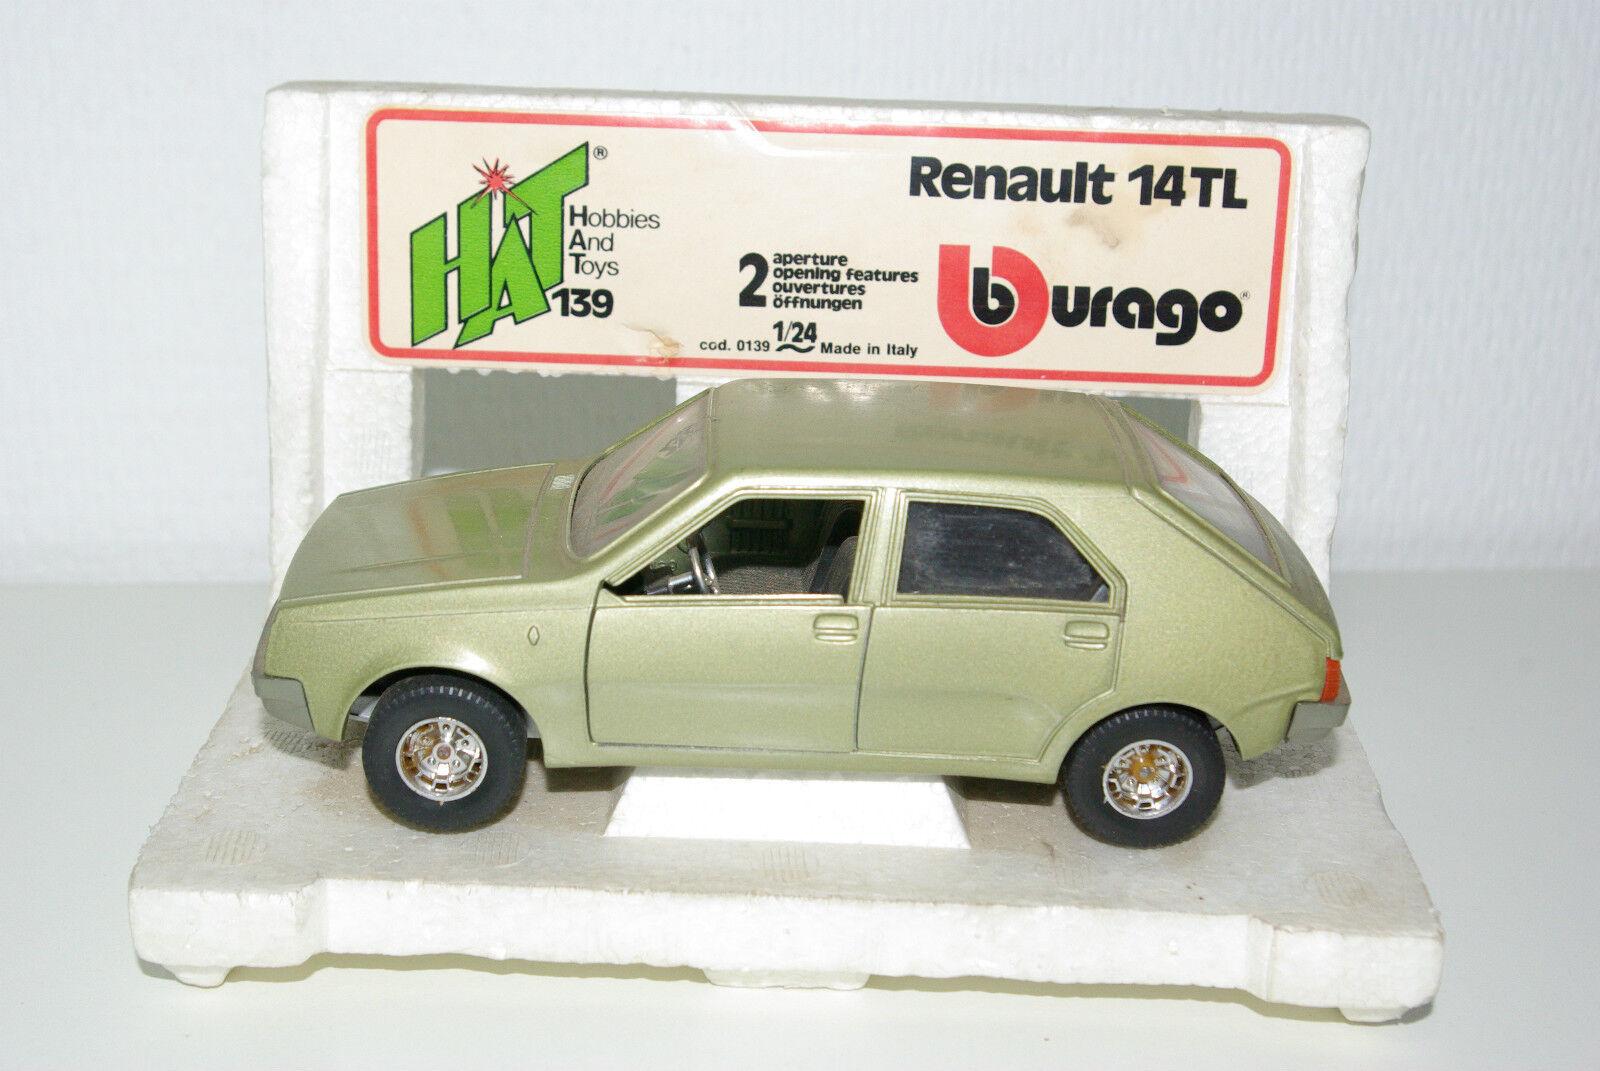 Bburago Burago 139 Renault 14 TL 14TL Metallic Light Green Near Mint Boxed